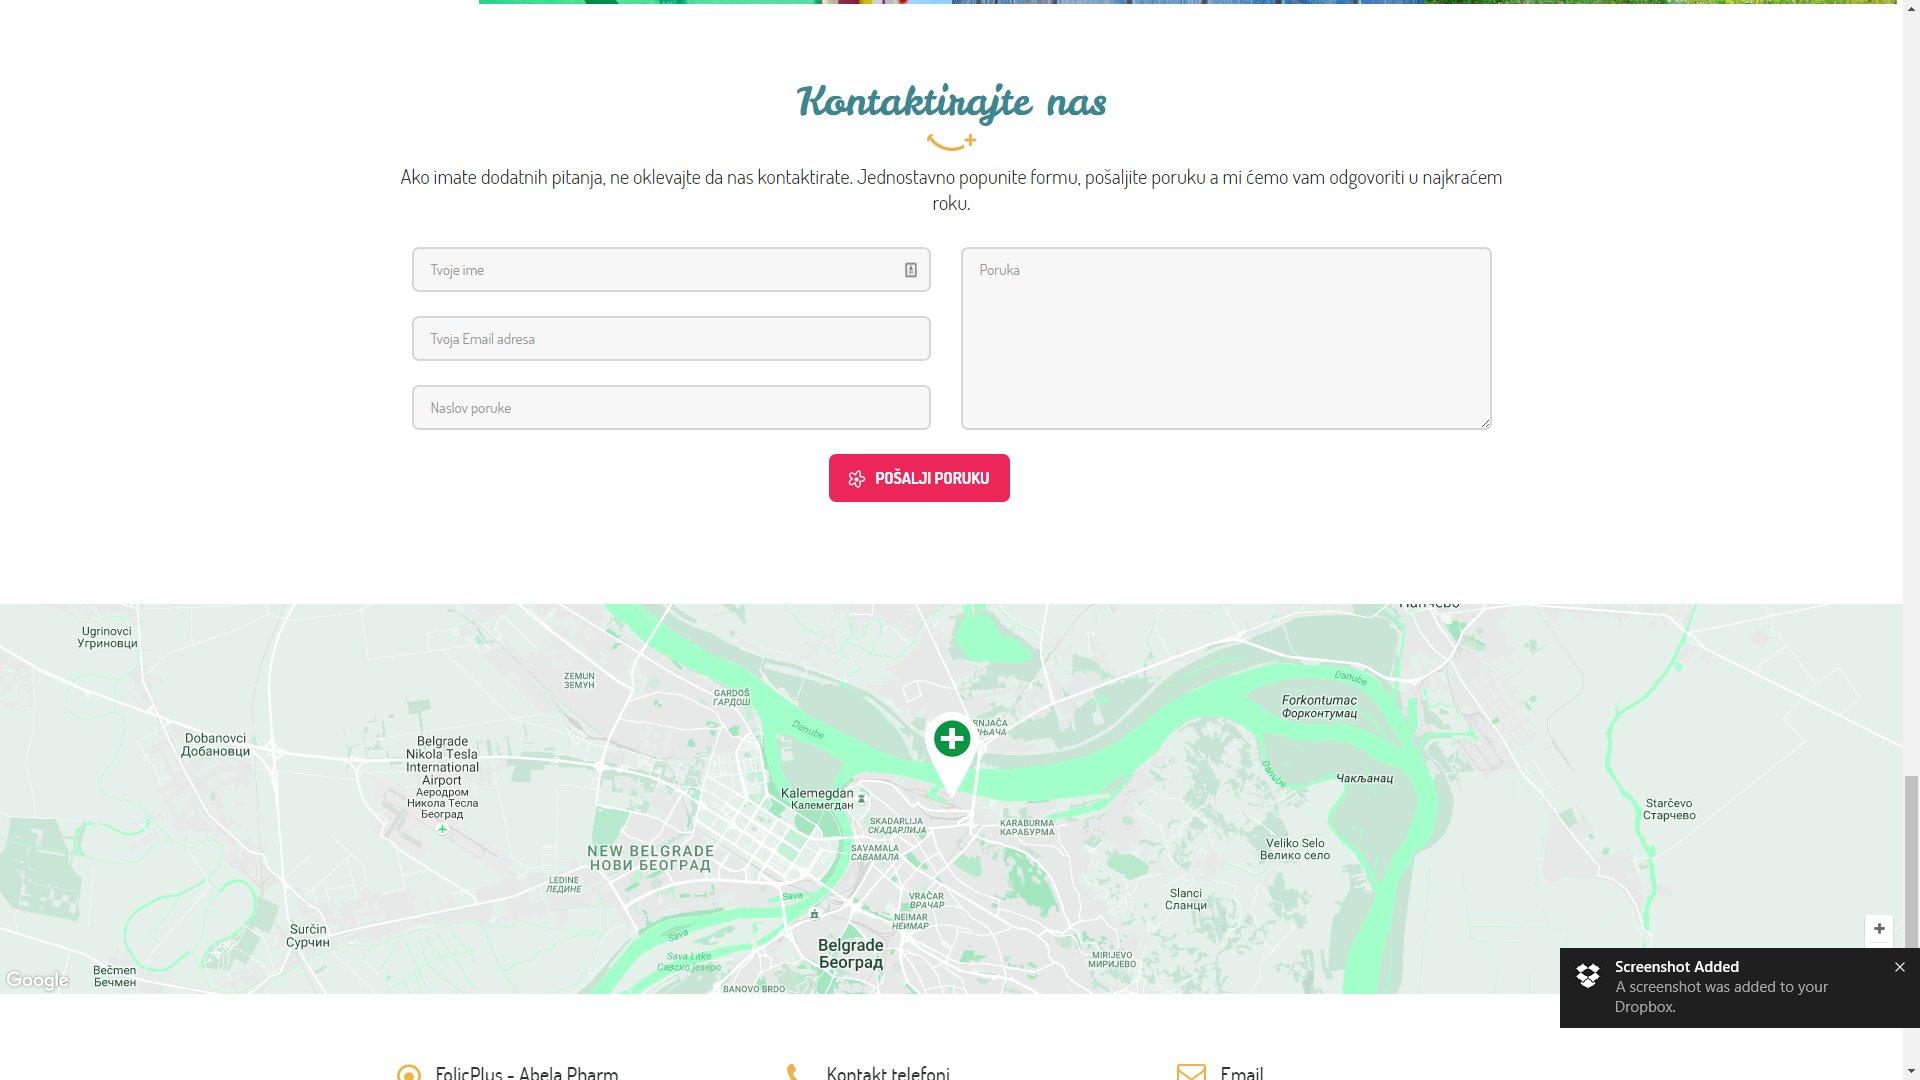 Folic Plus website - ss4